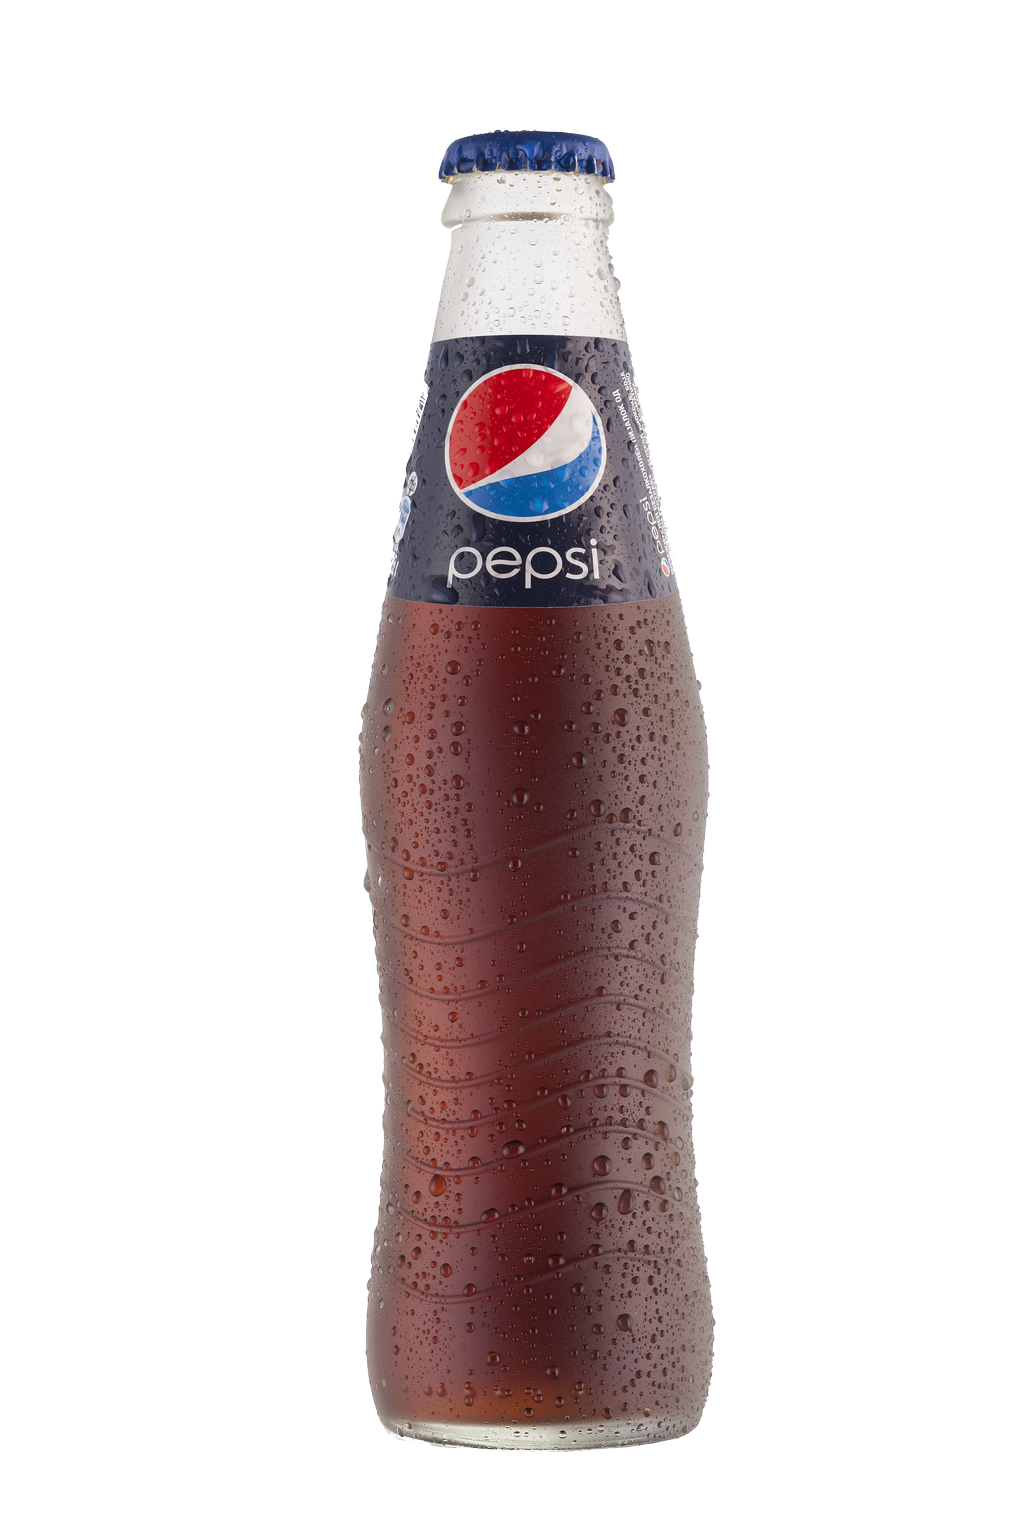 vector download Vector bottle pepsi. Transparent png pictures free